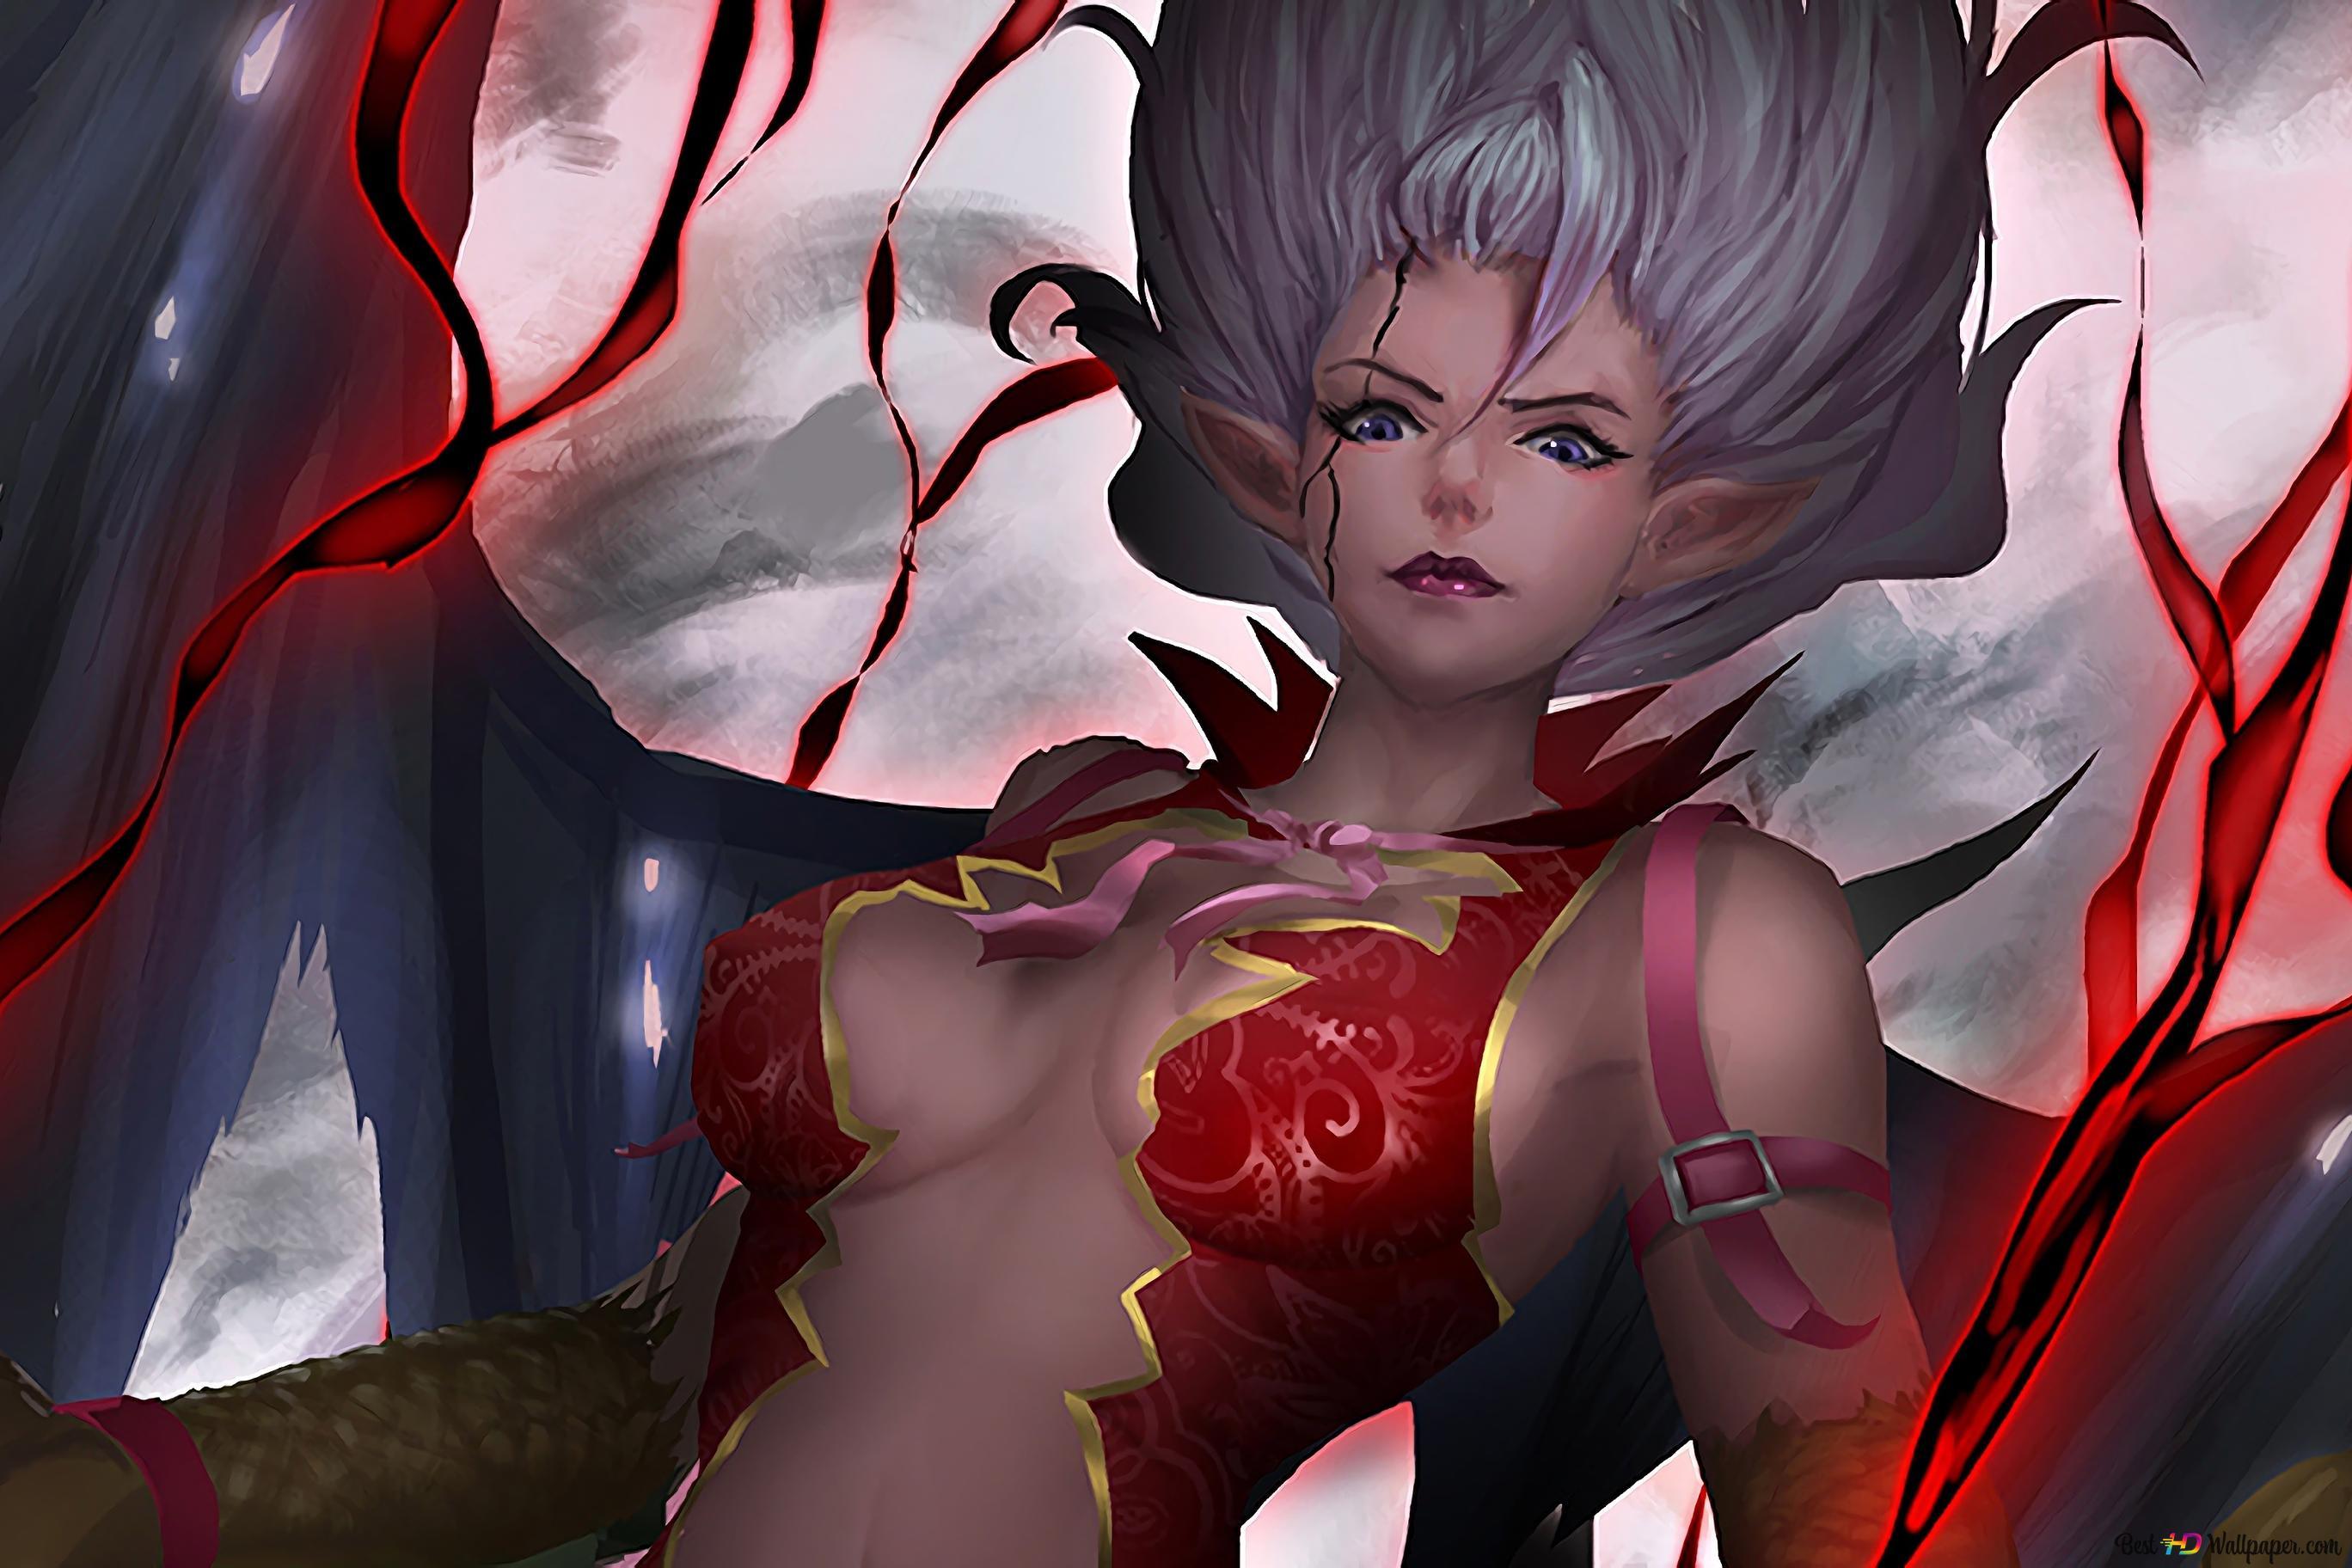 Fairy Tail Mirajane Strauss Satan Soul Hd Wallpaper Download Mirajane strauss, daughter of the renowned pro hero kemono strauss. fairy tail mirajane strauss satan